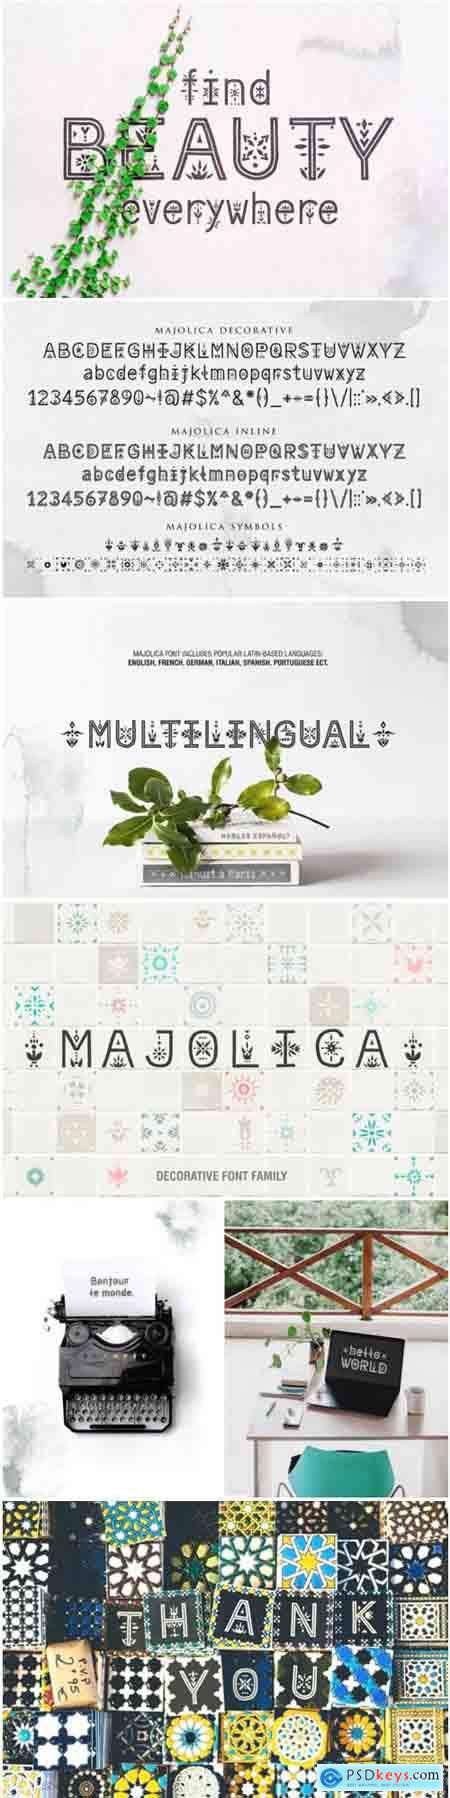 Majolica Font